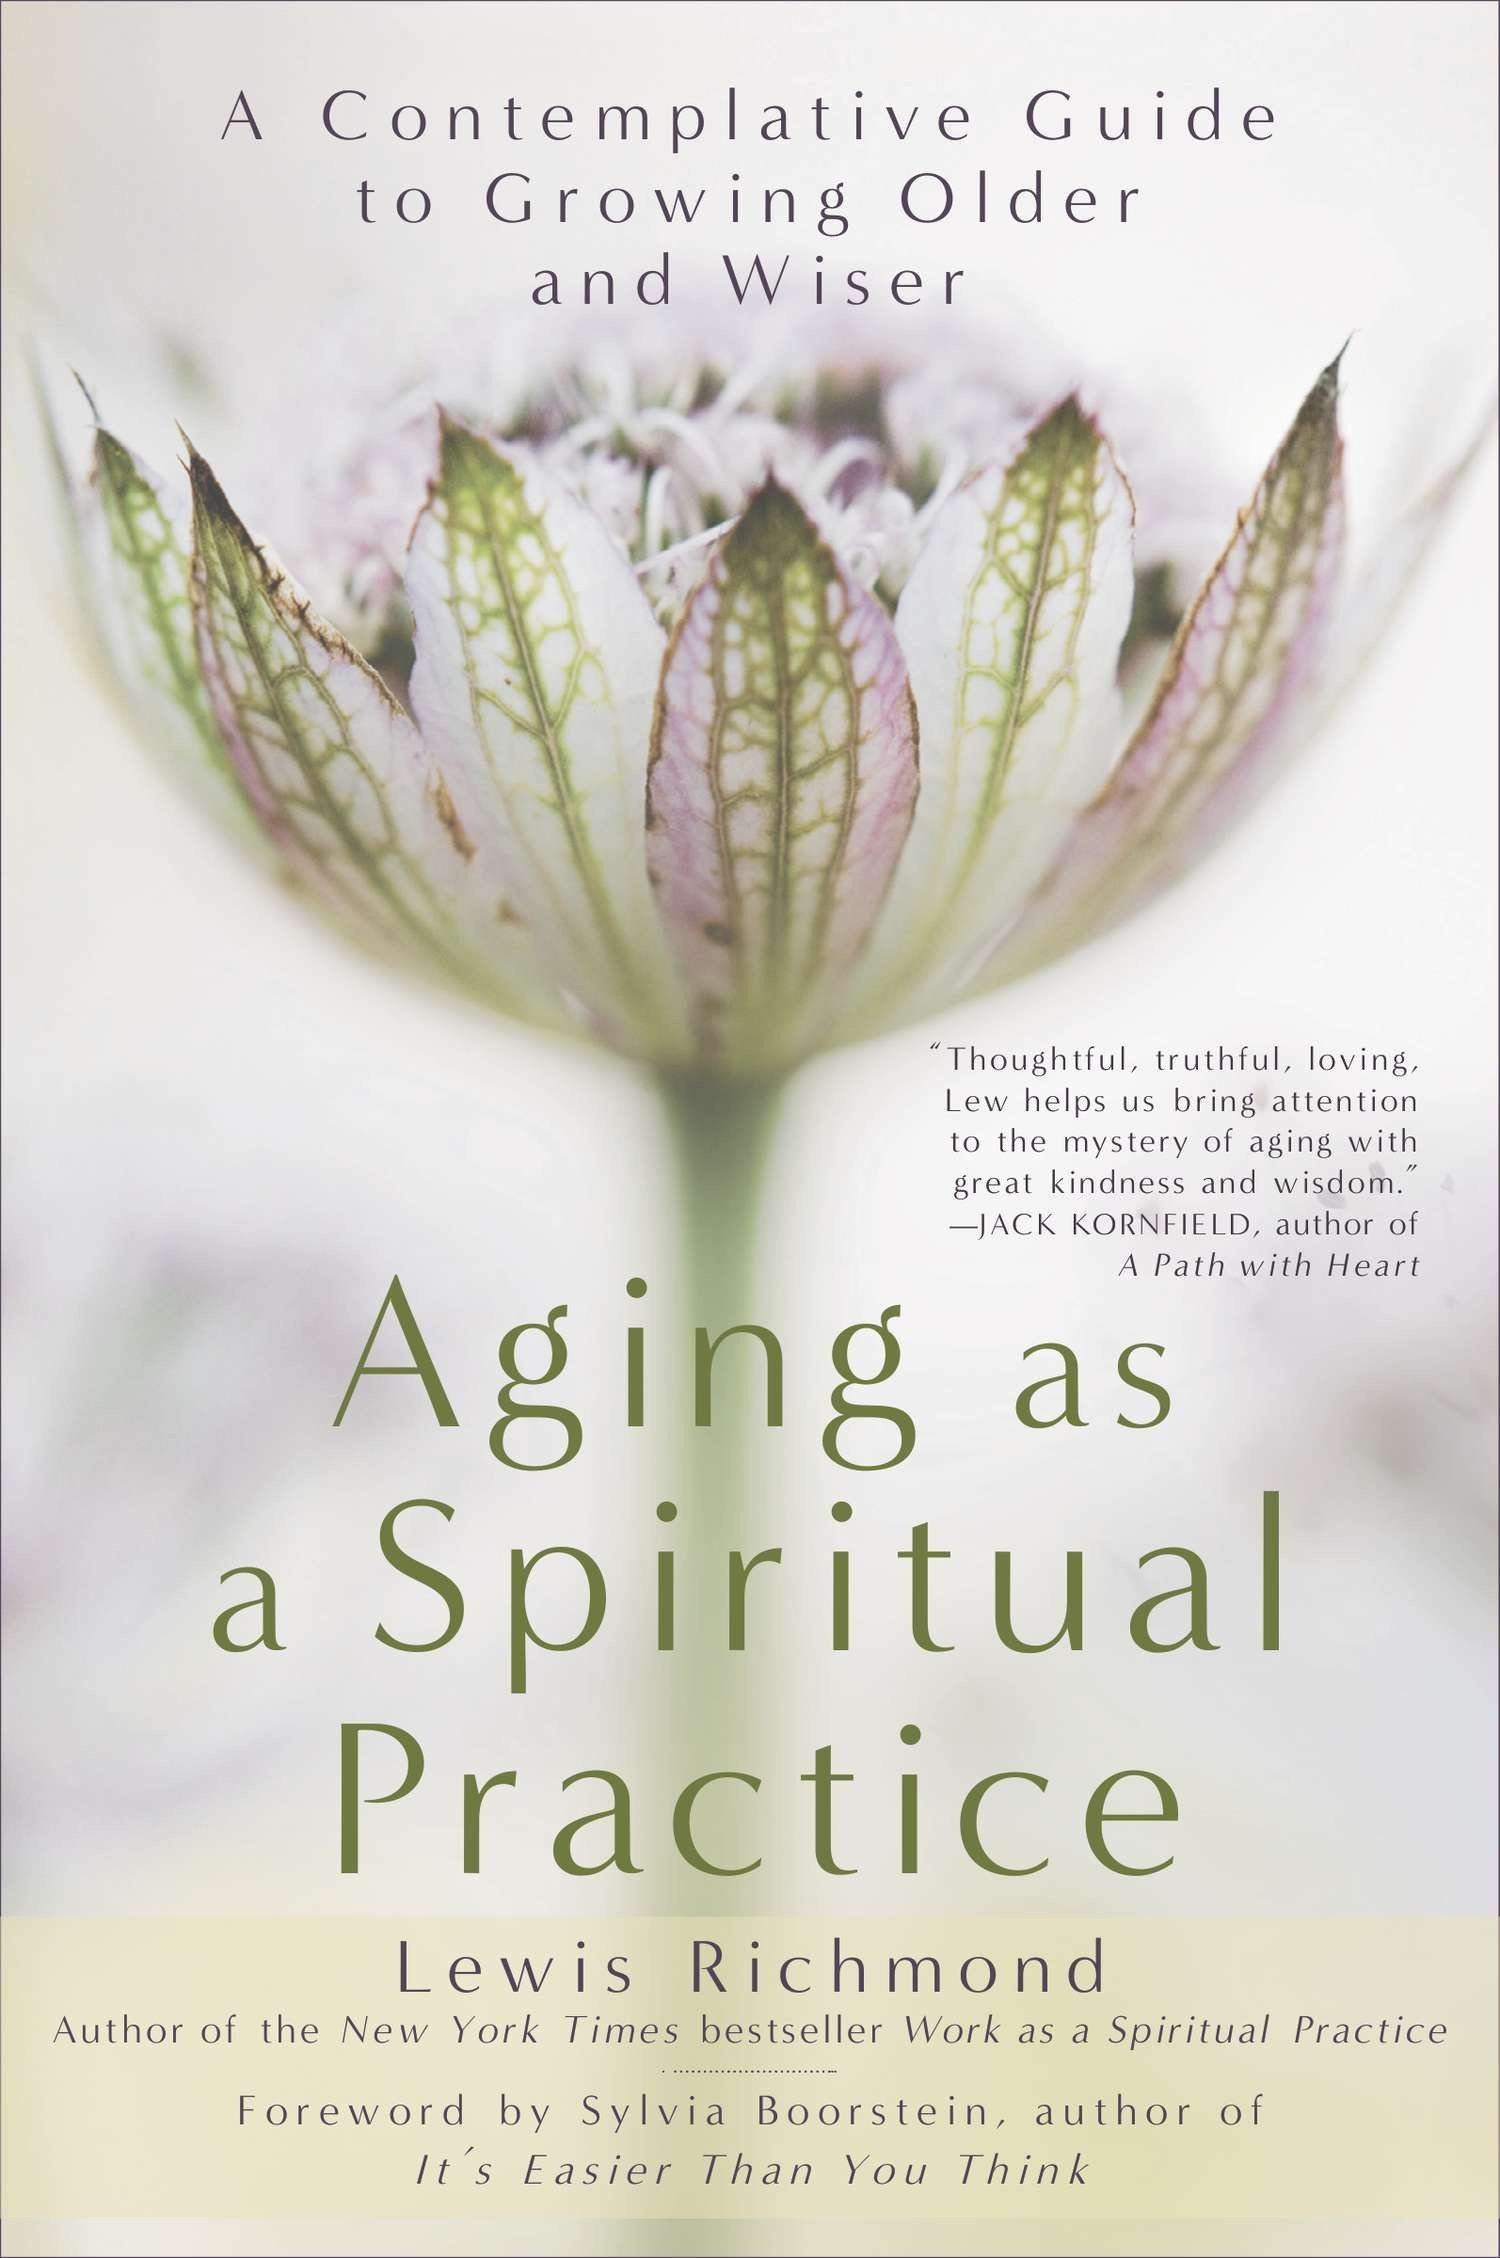 Aging Ageing As A Spiritual Practice (book)